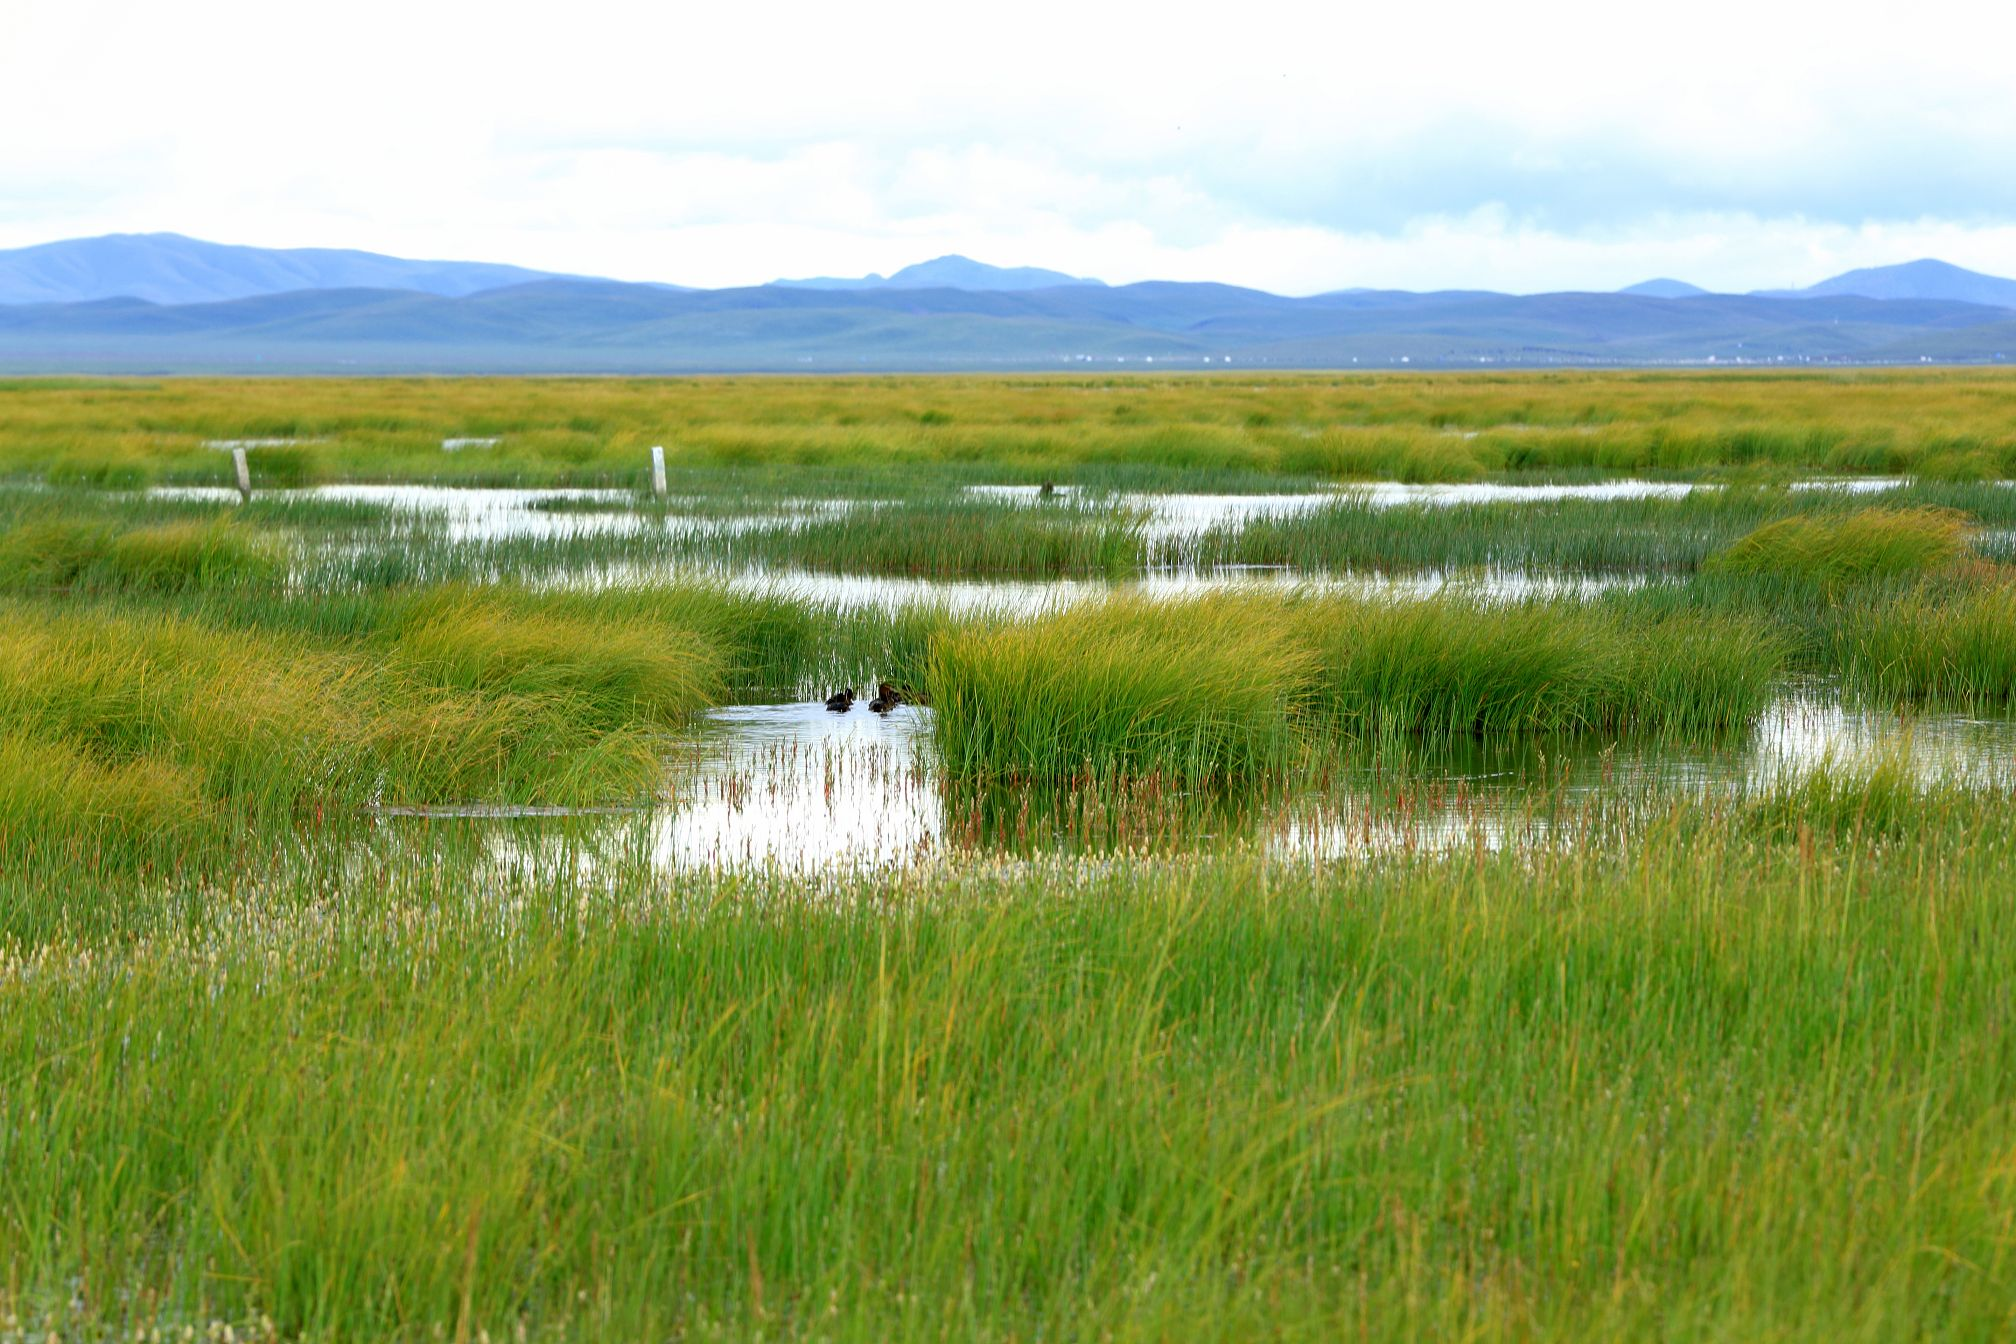 The Charming Grassland In Aba Prefecture